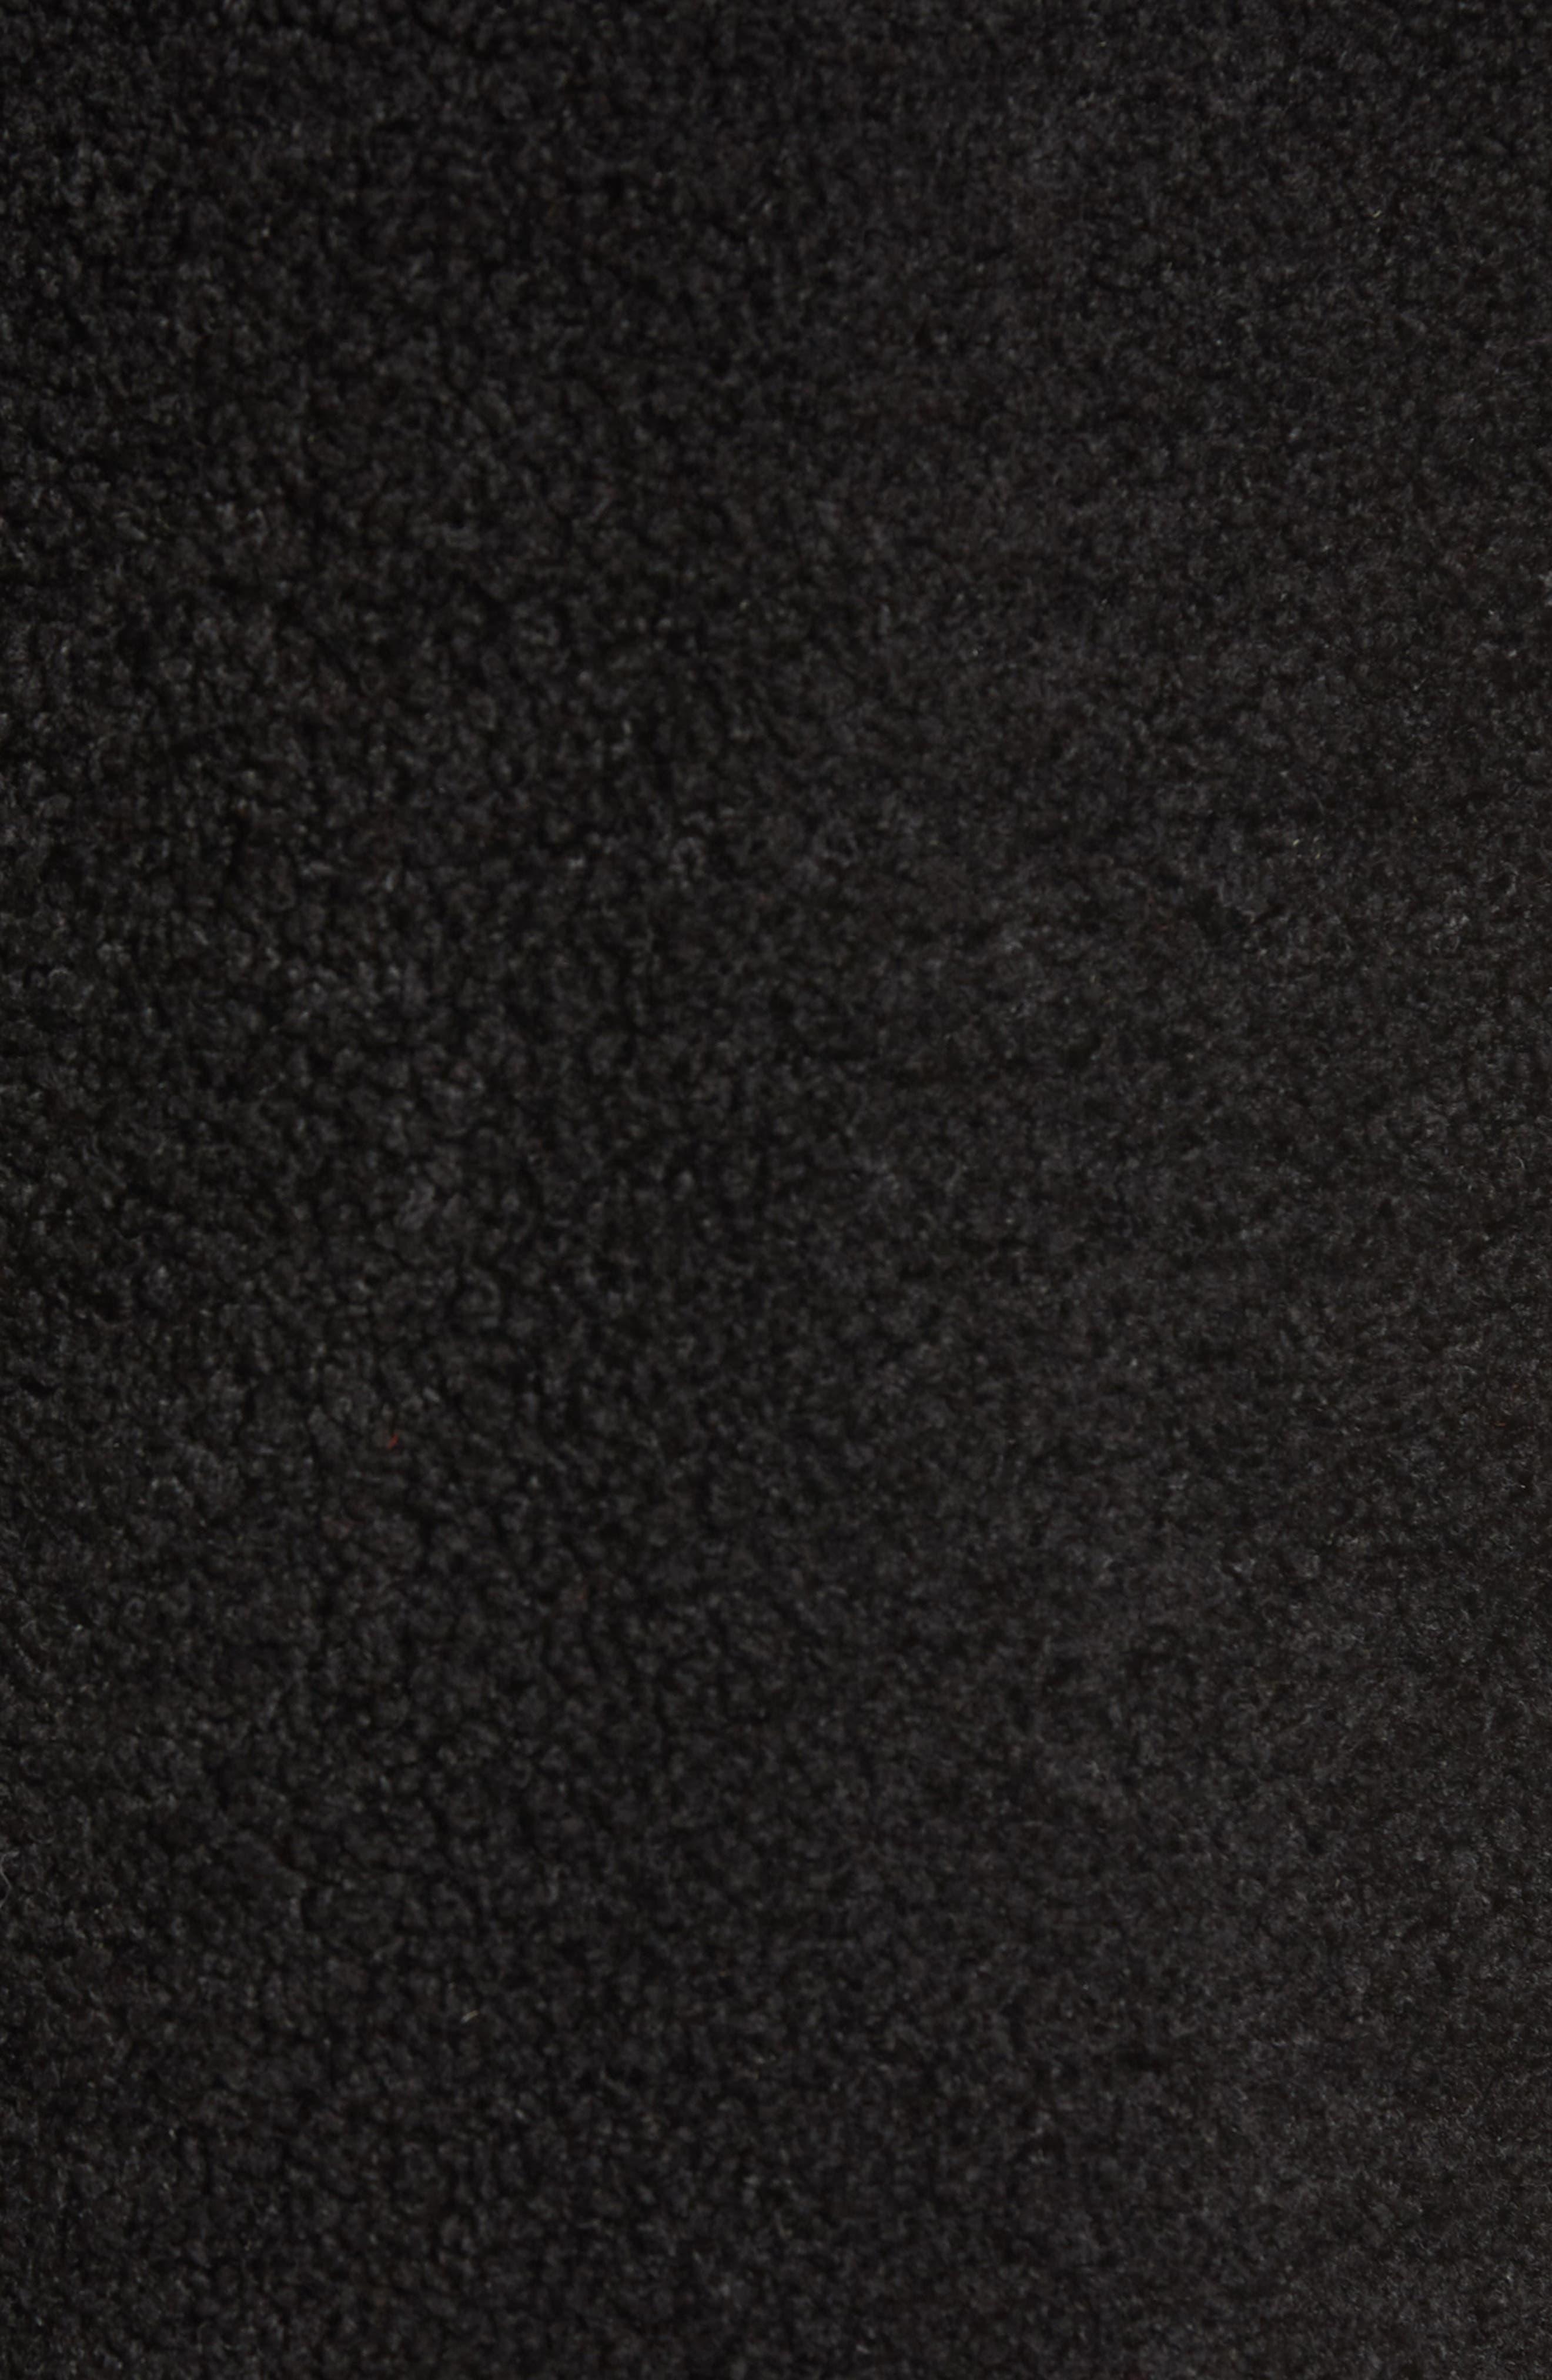 Reversible Lux Faux Shearling Coat,                             Alternate thumbnail 8, color,                             BLACK